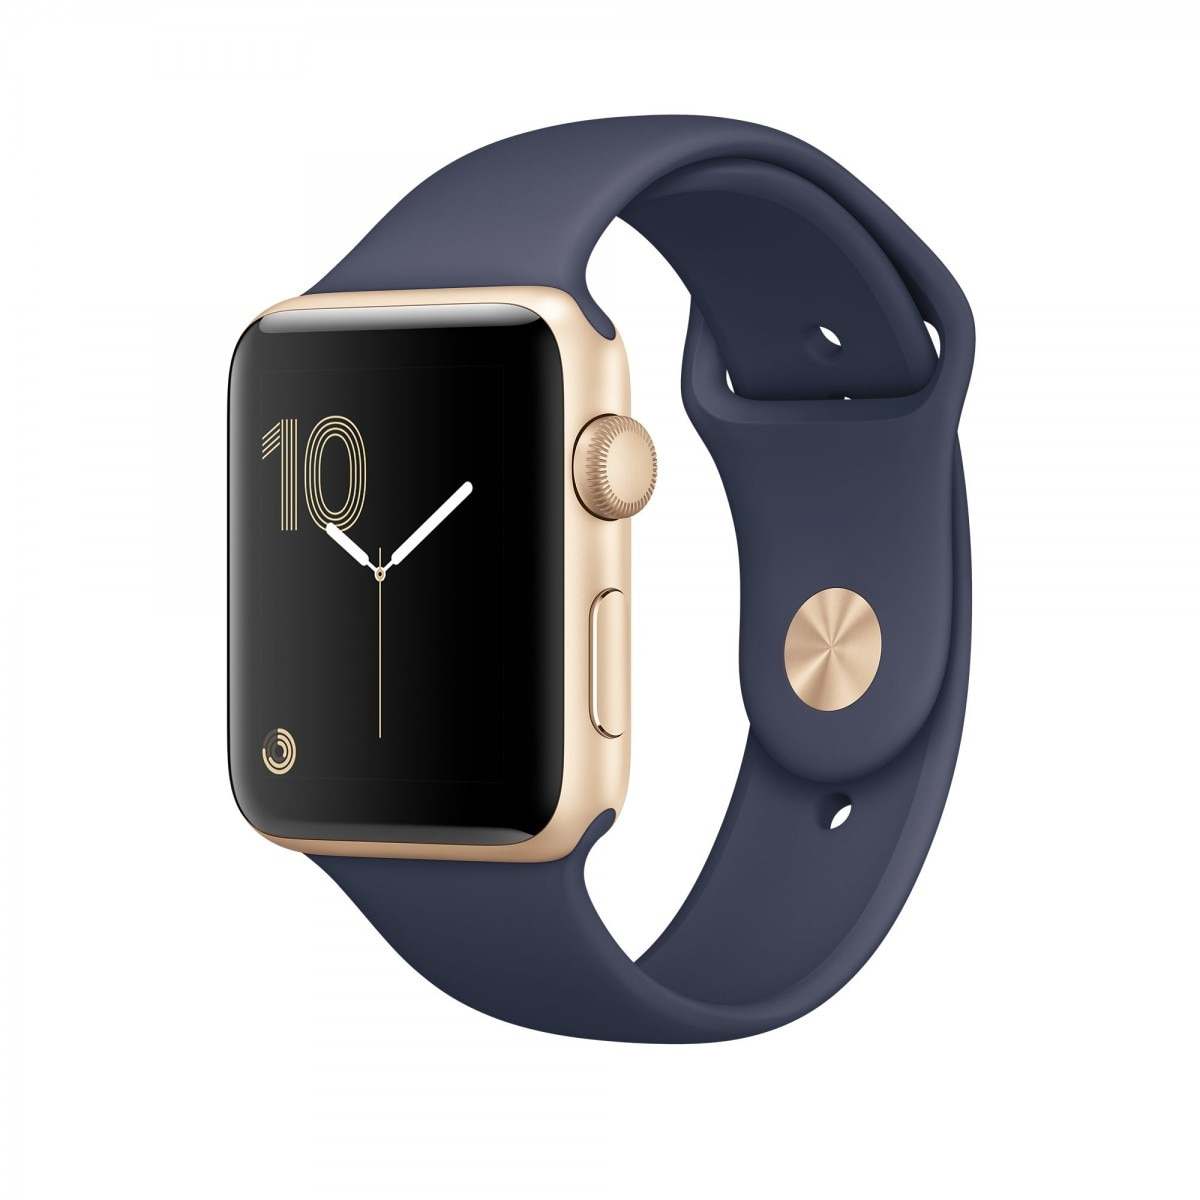 Fotografie Apple Watch 2 cu carcasa din aluminiu gold, 42mm, Midnight Blue Sport Band